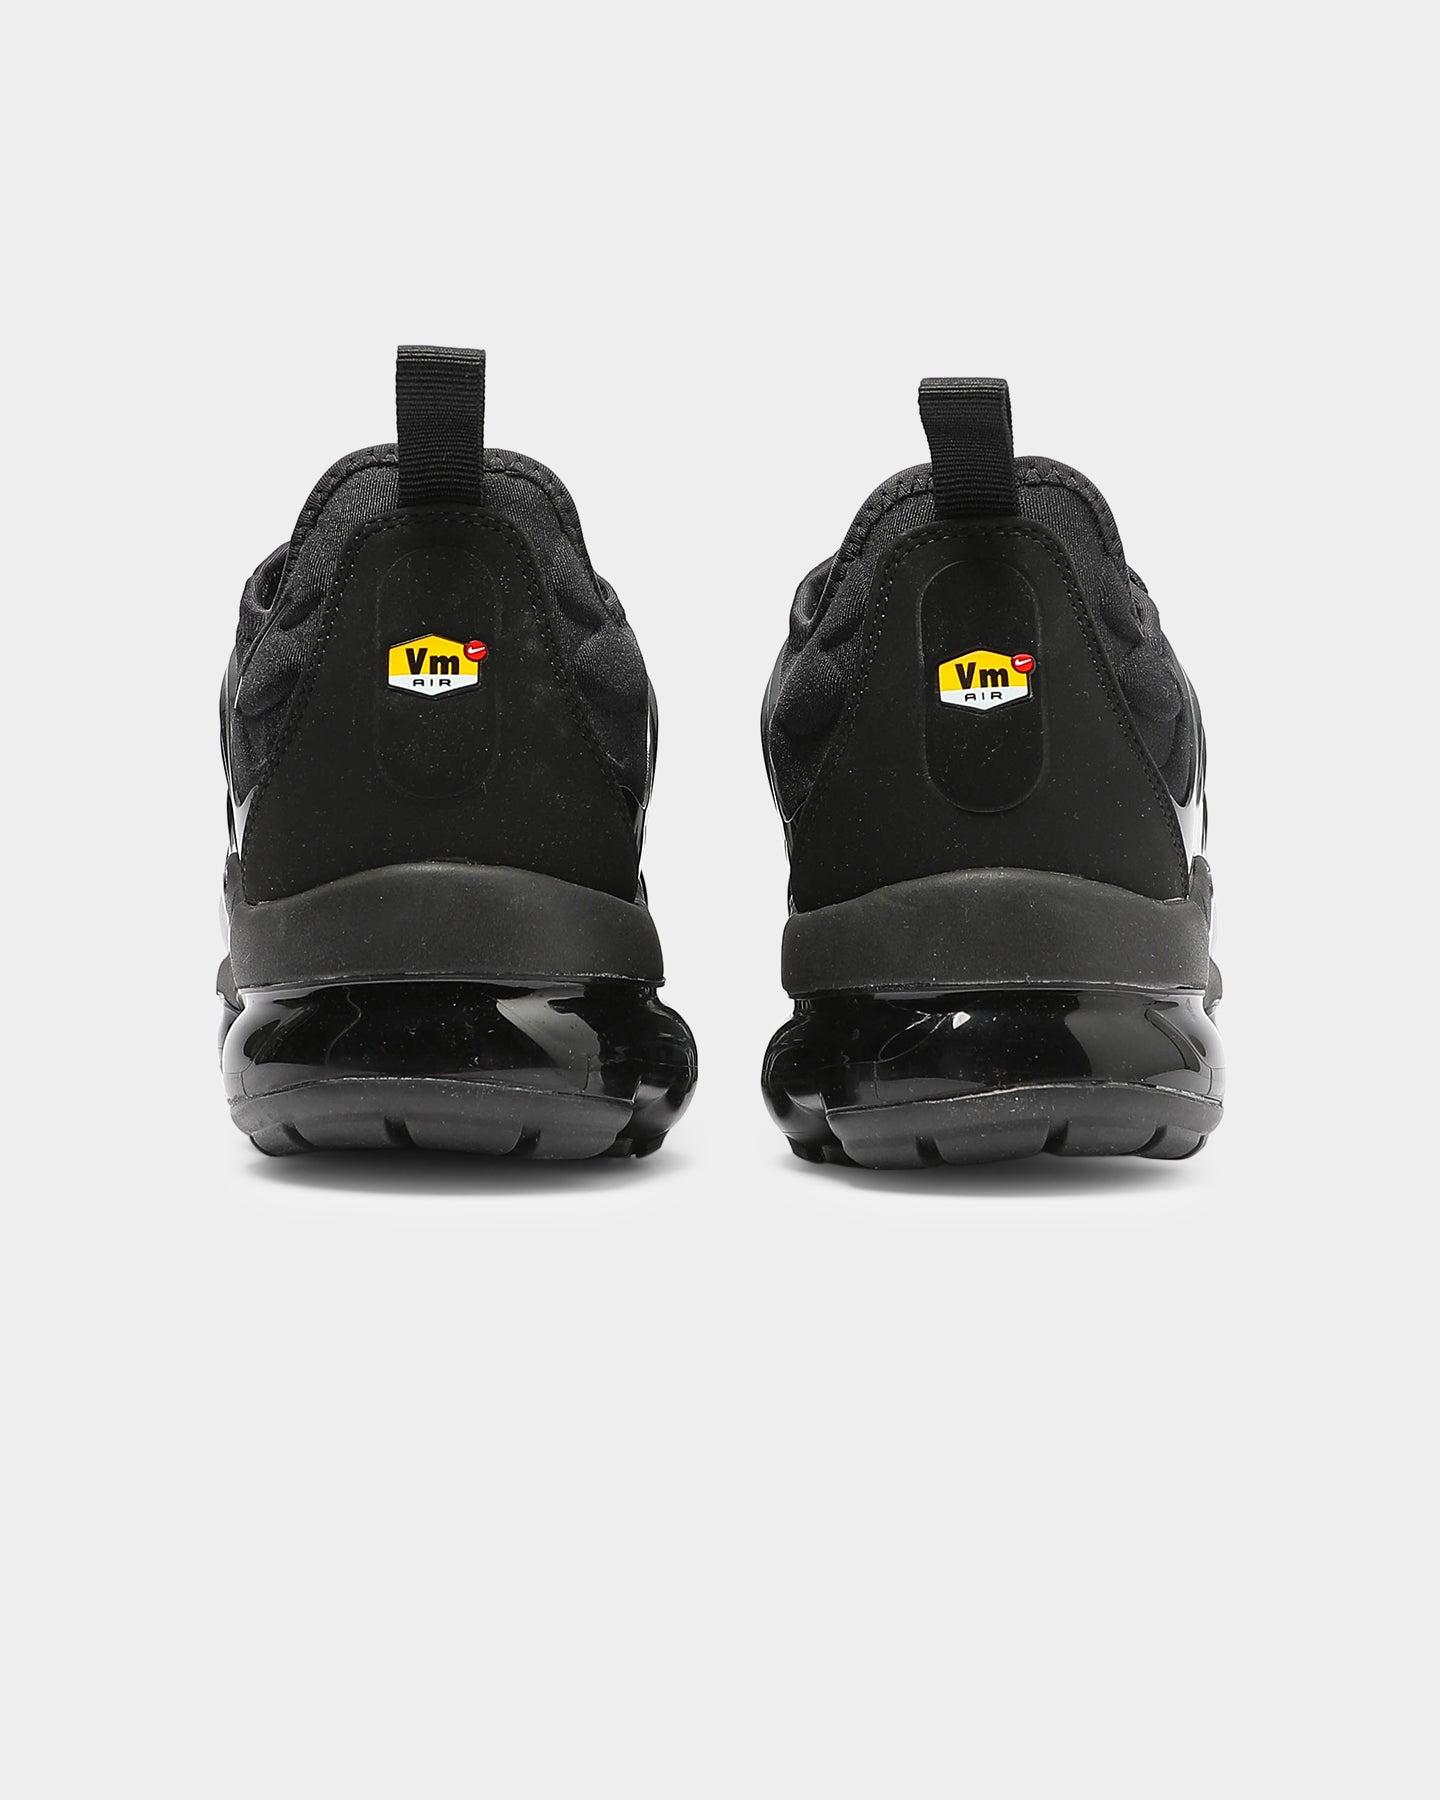 Nike Air Vapormax Plus Black/Black